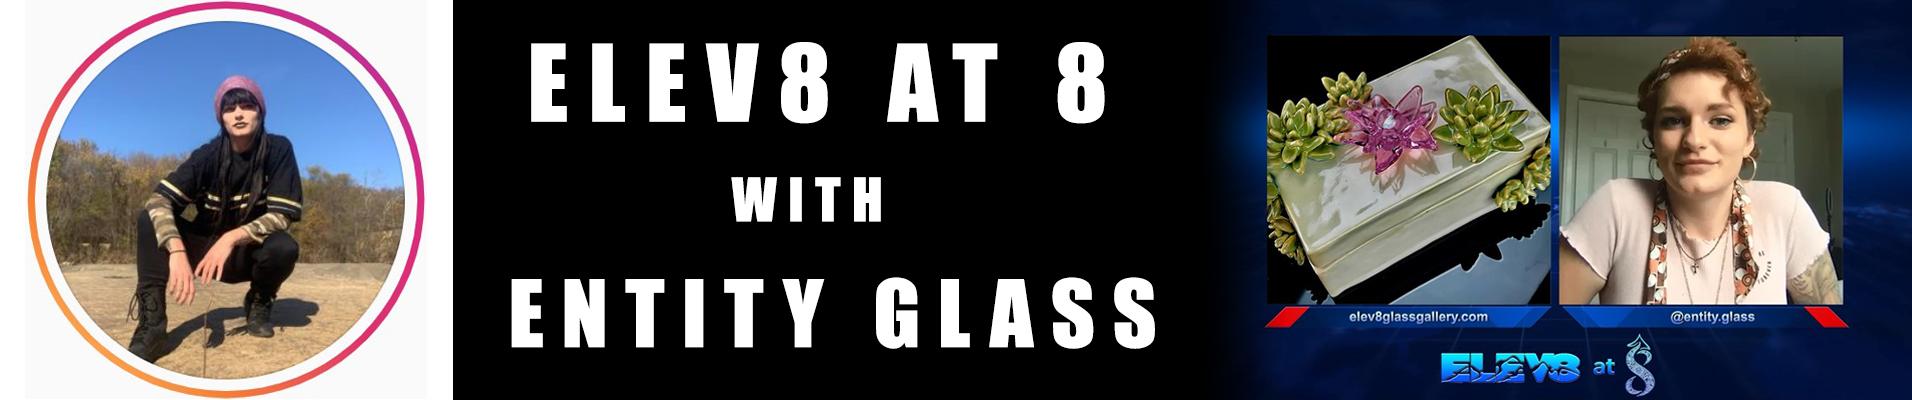 entity-glass-banner.jpg